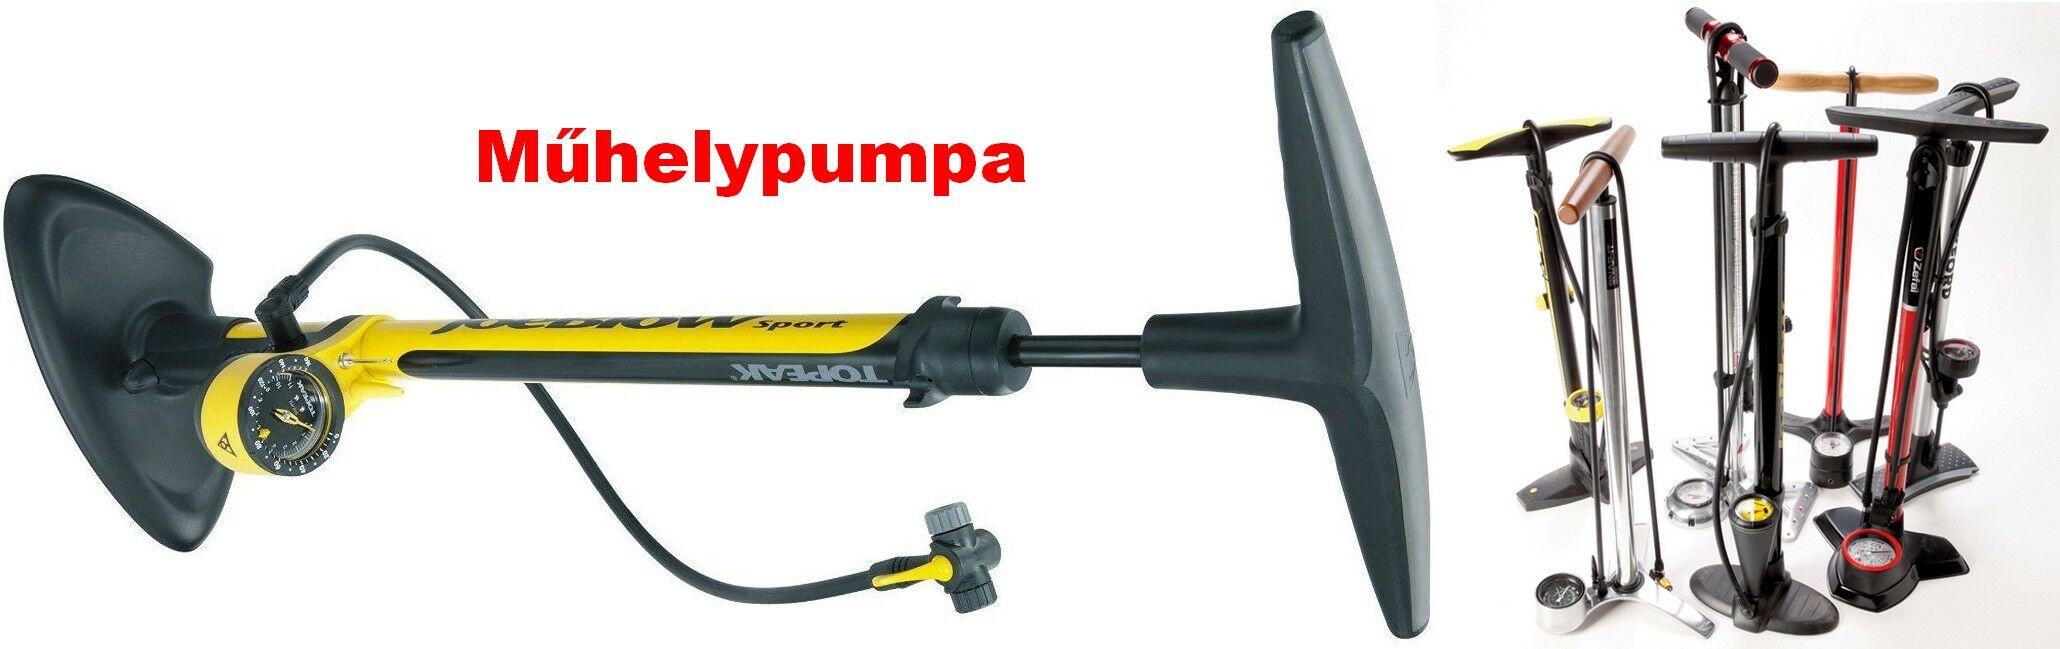 Műhelypumpa - bikepro.hu